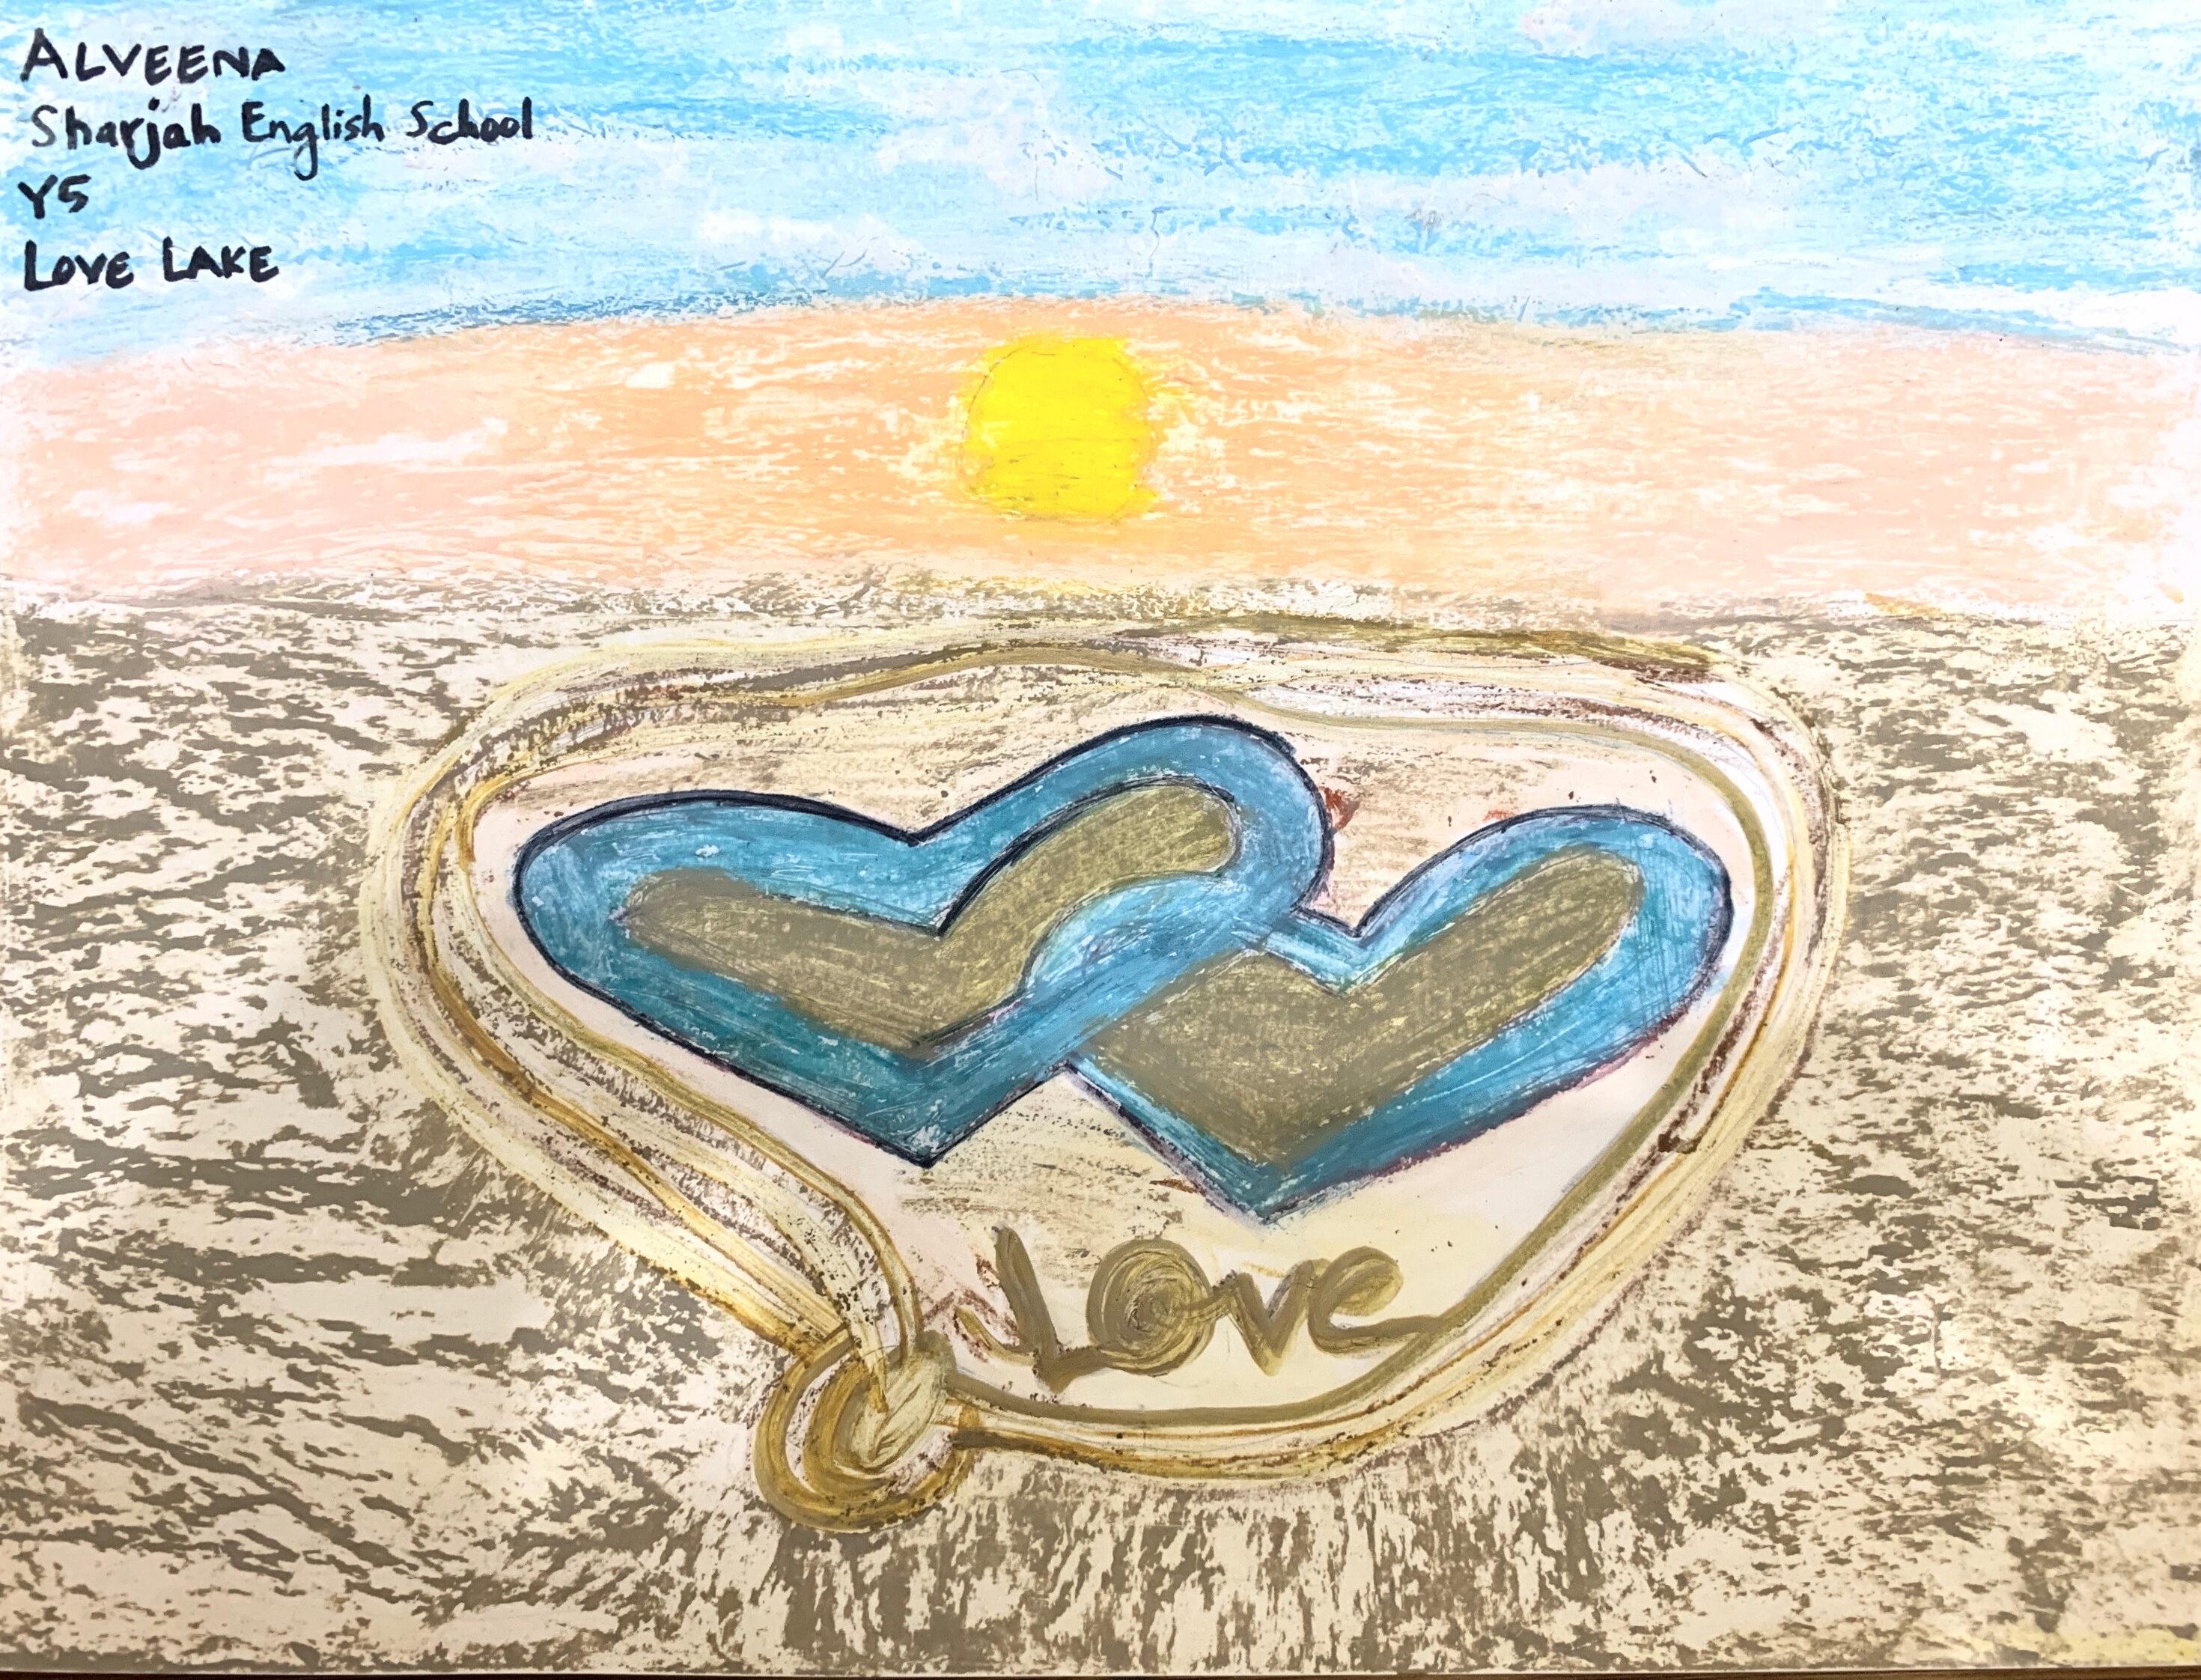 Love Lake by Alveena